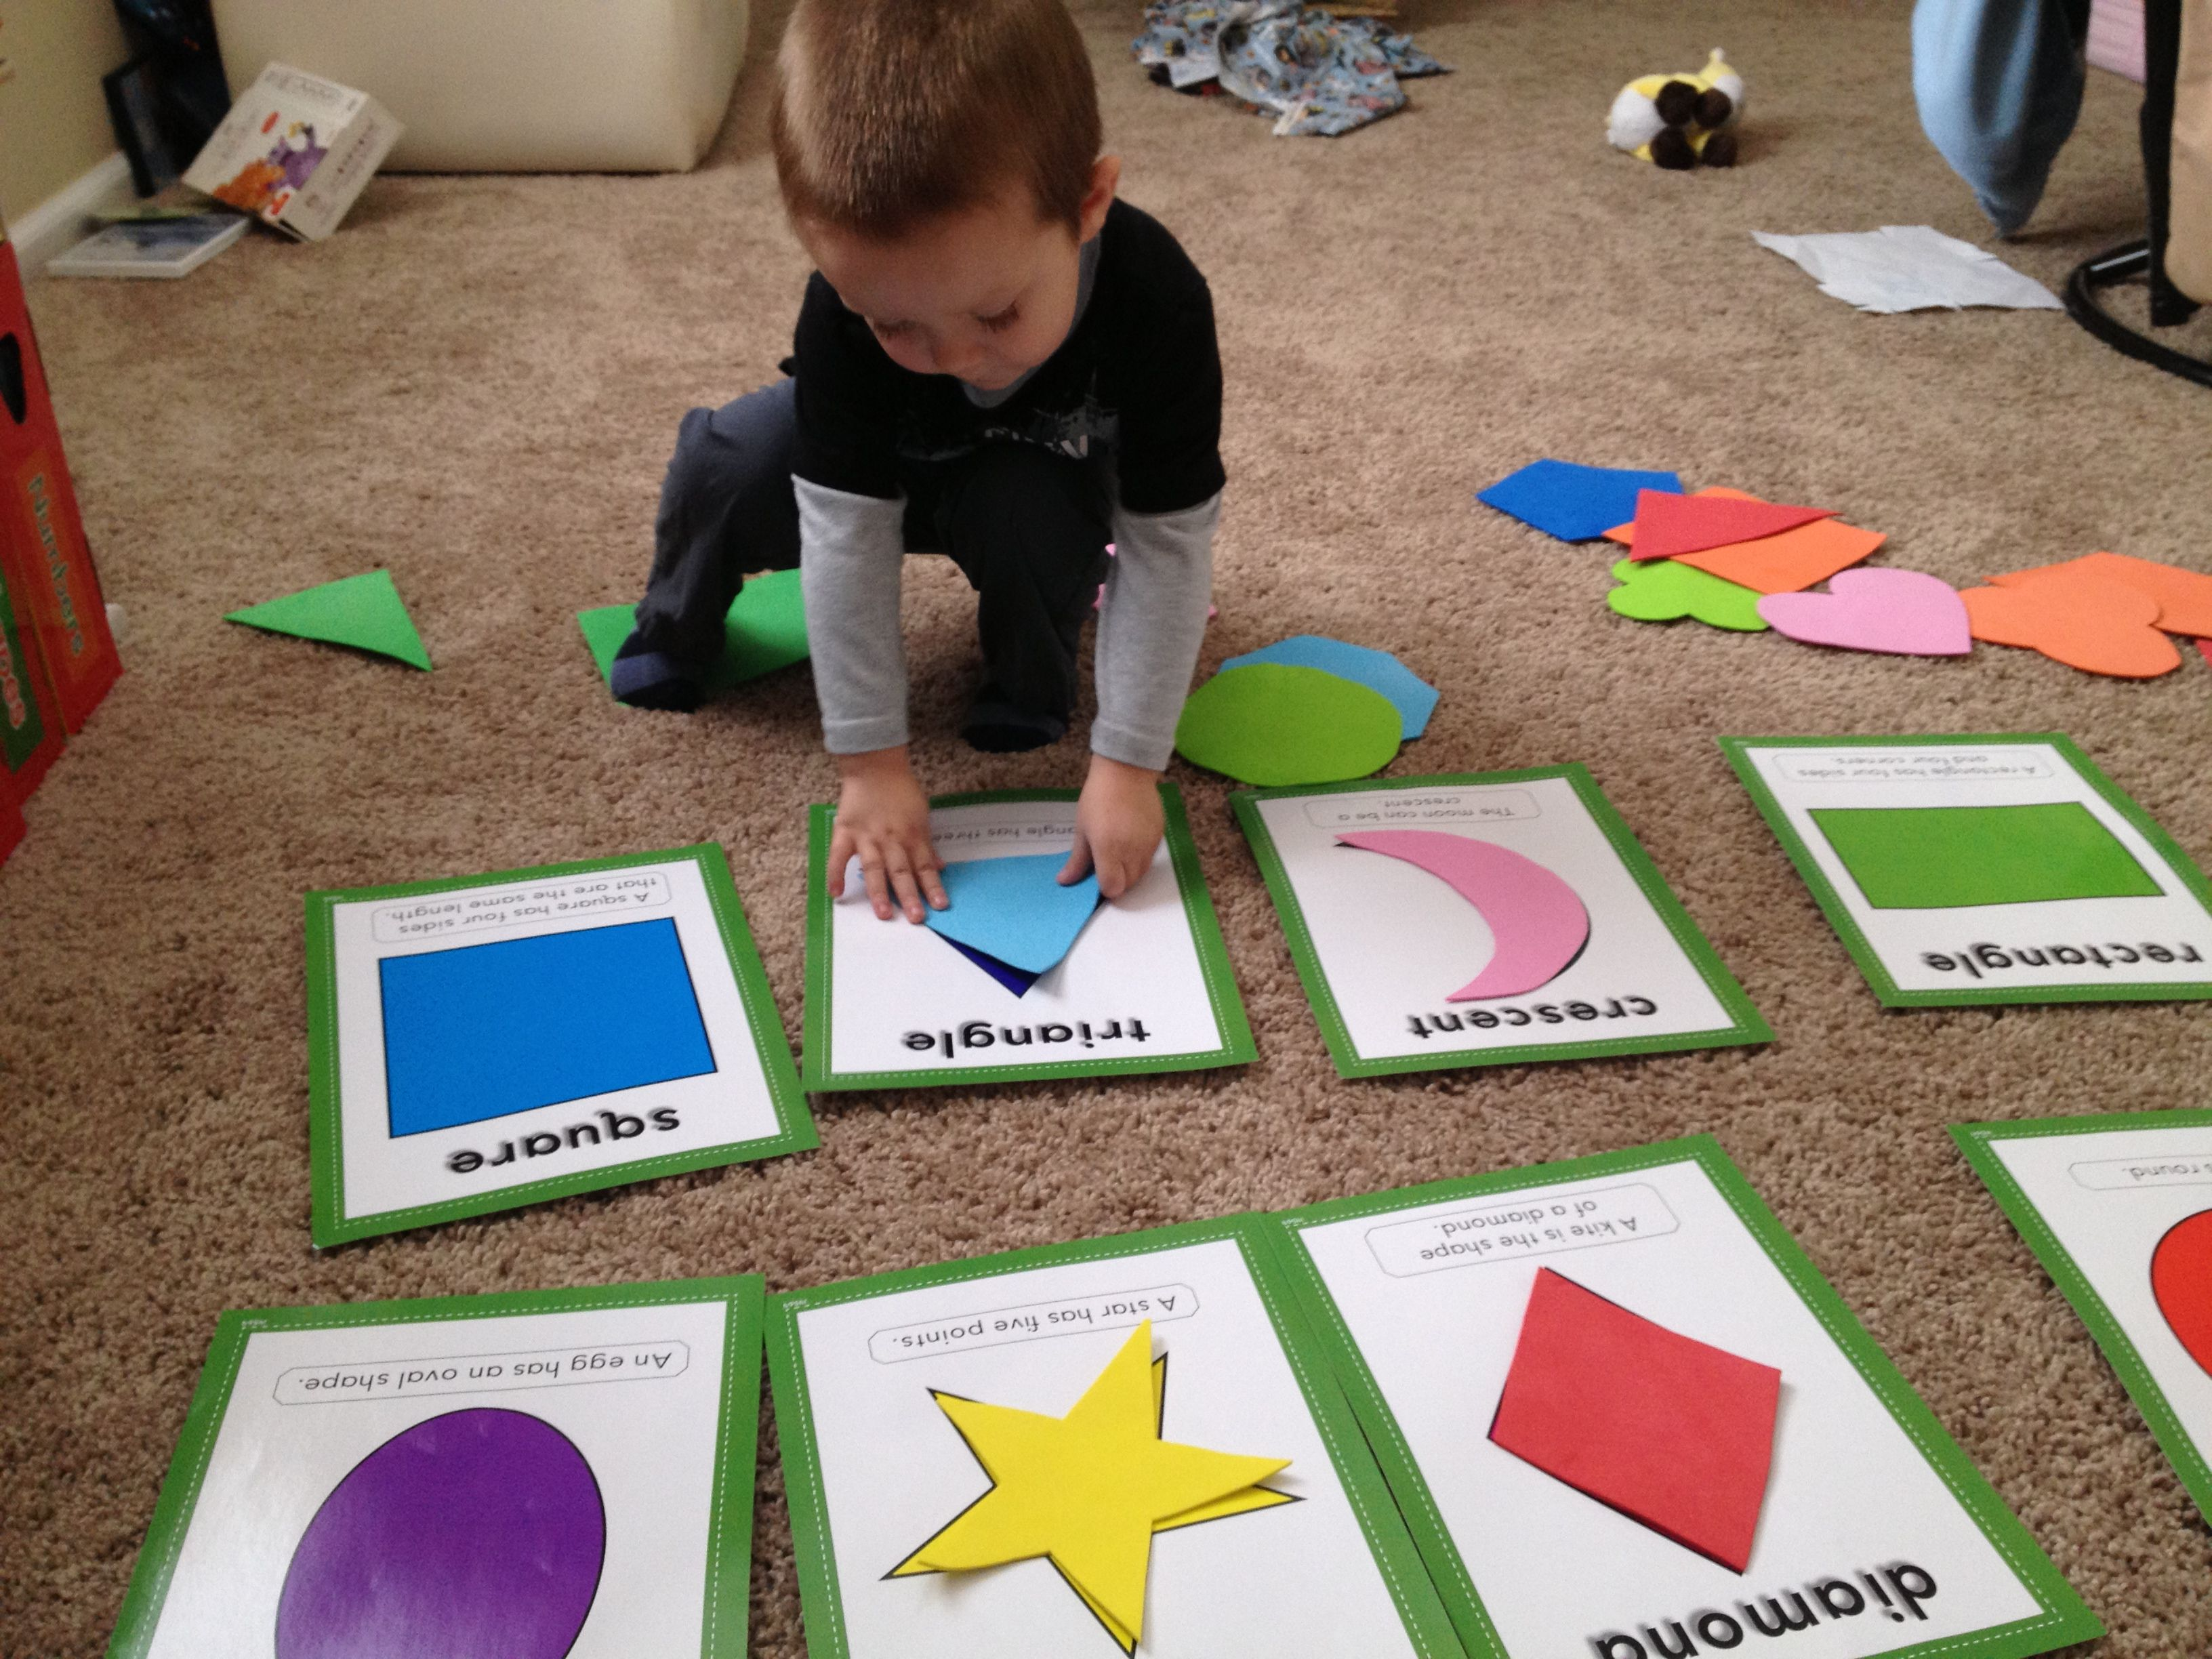 SHAPES: Match Foam Shape To Corresponding Card (to Make